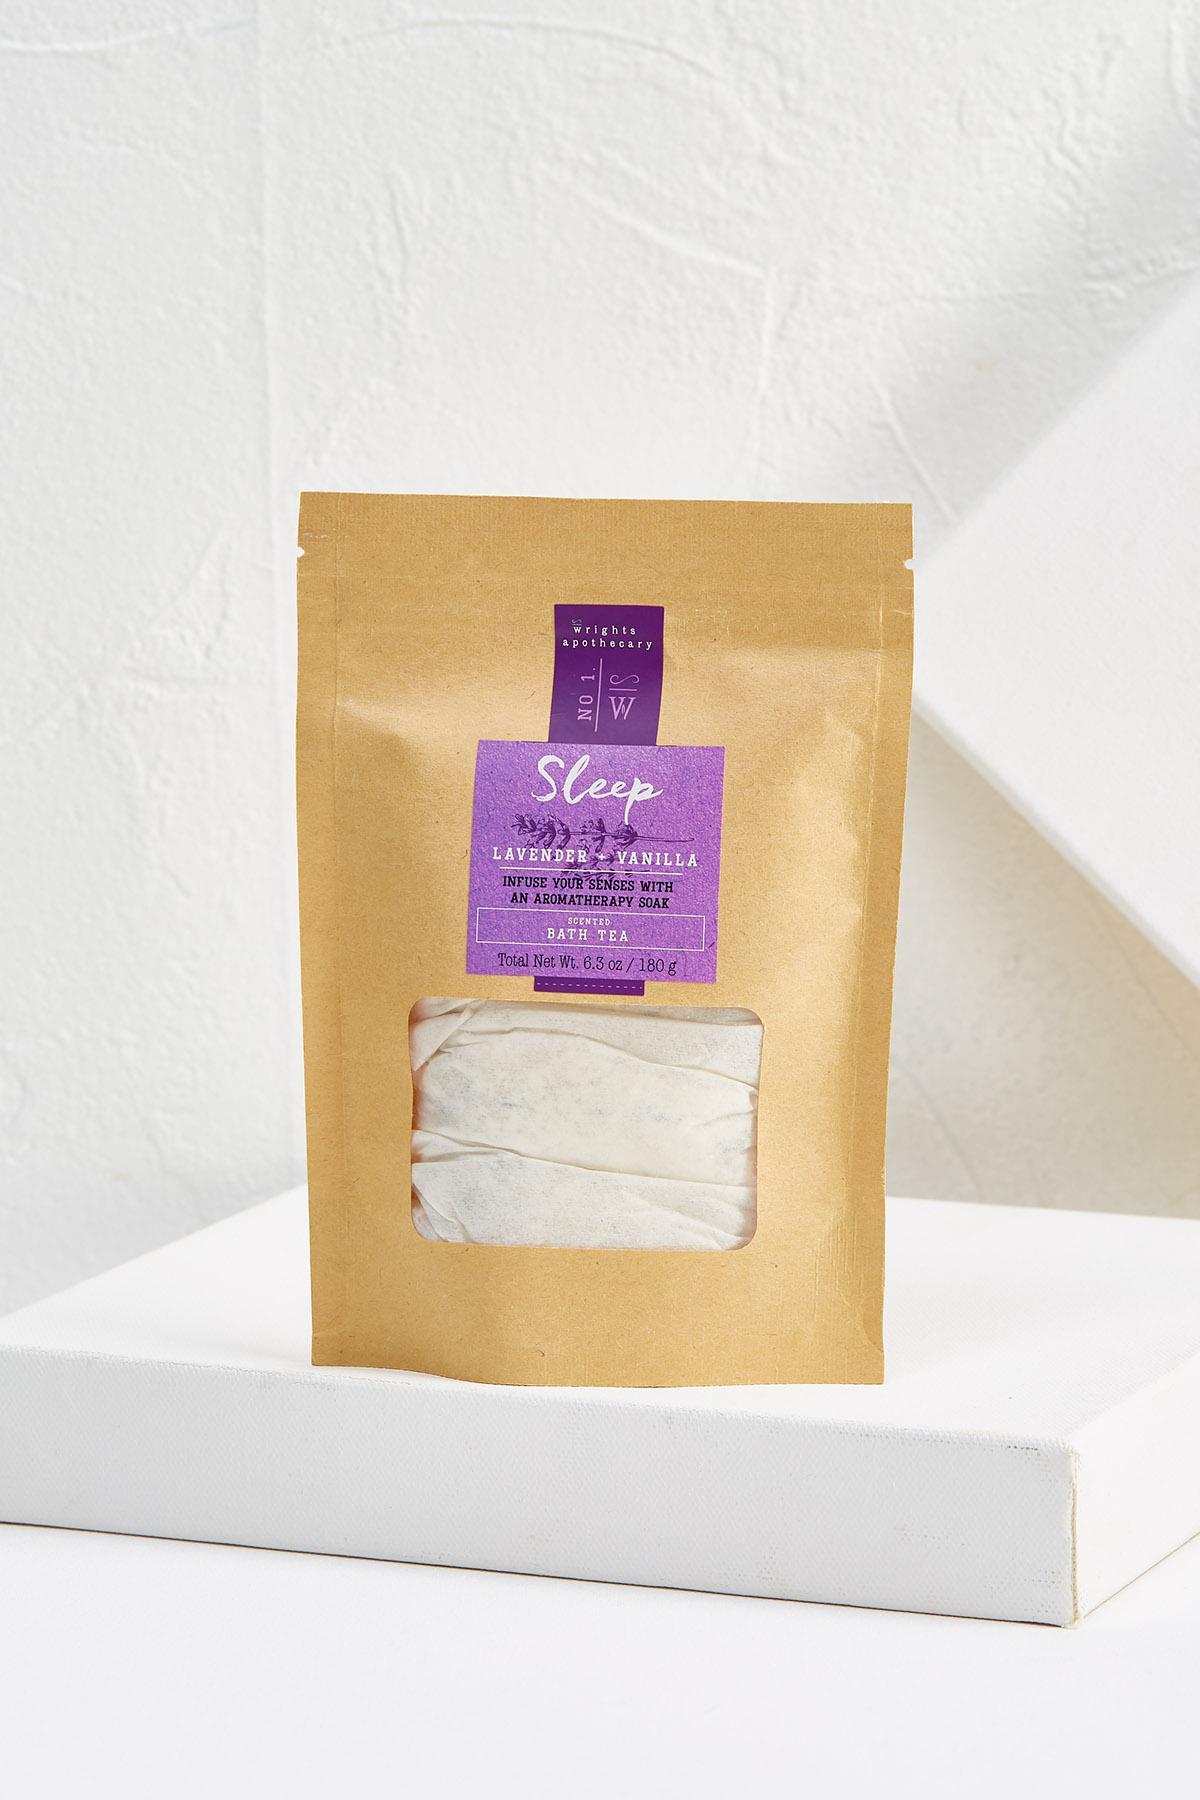 Sleep Aromatherapy Bath Soak